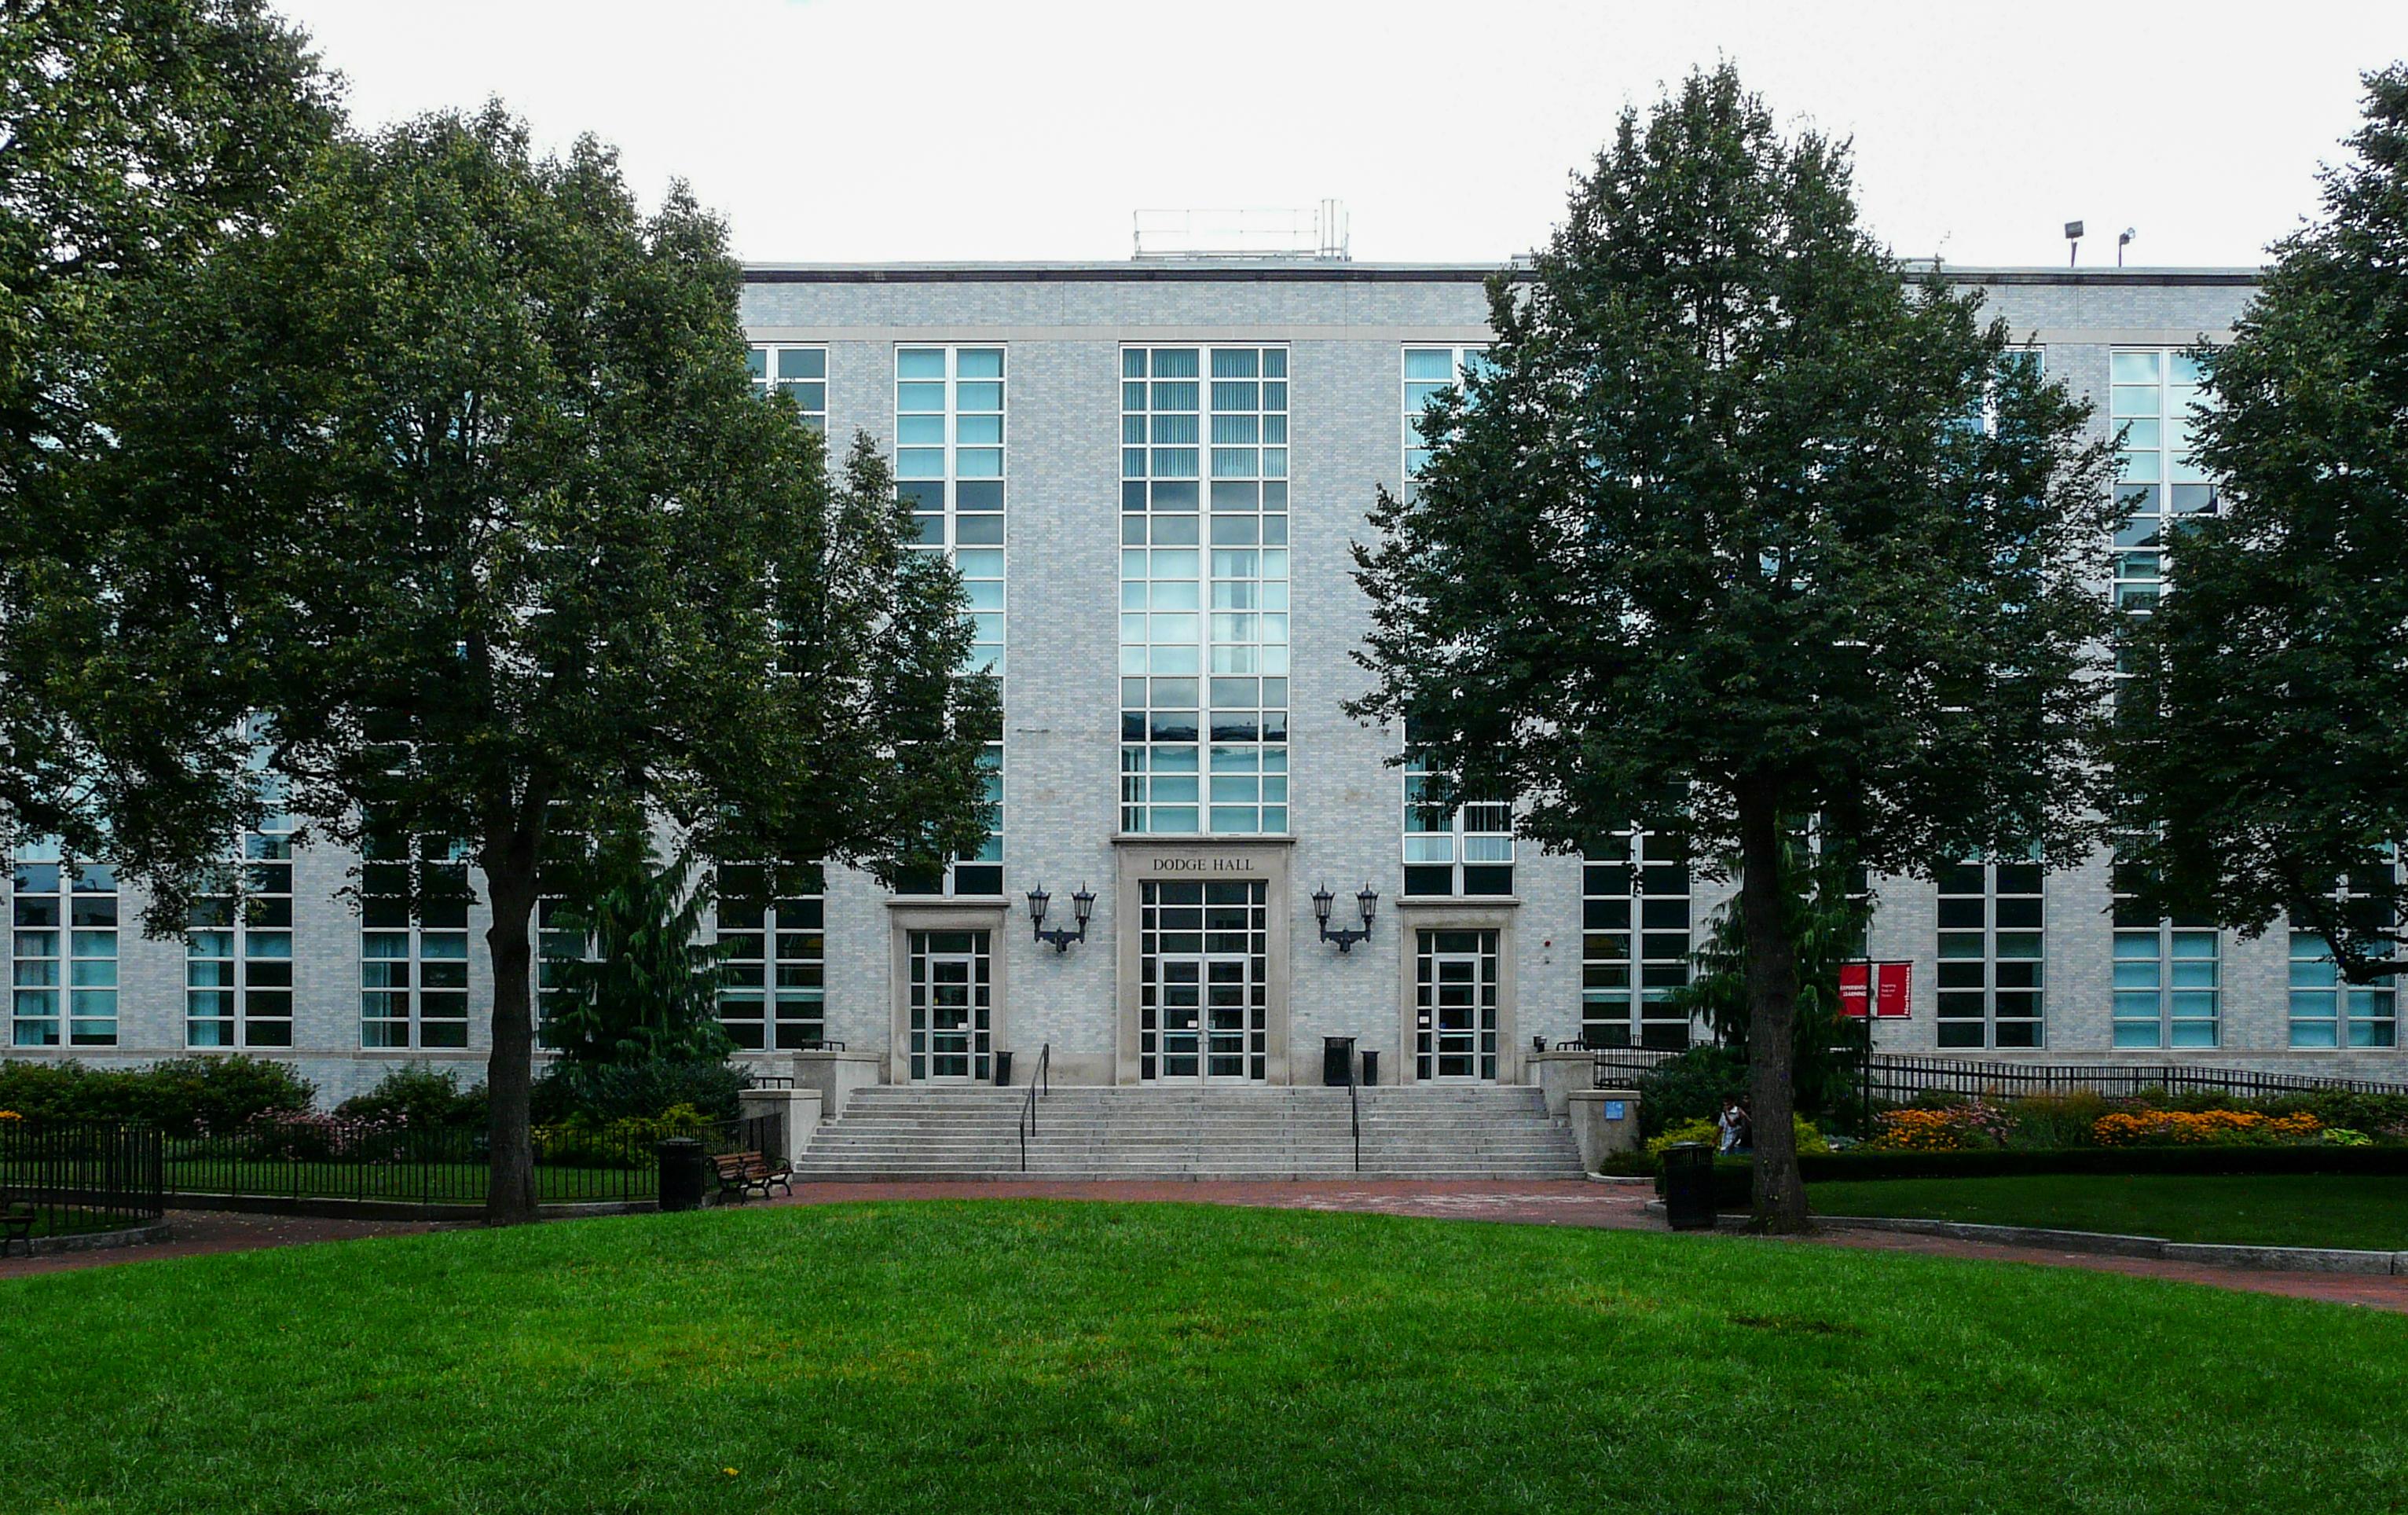 File:Dodge Hall Northeastern University.jpg - Wikimedia Commons